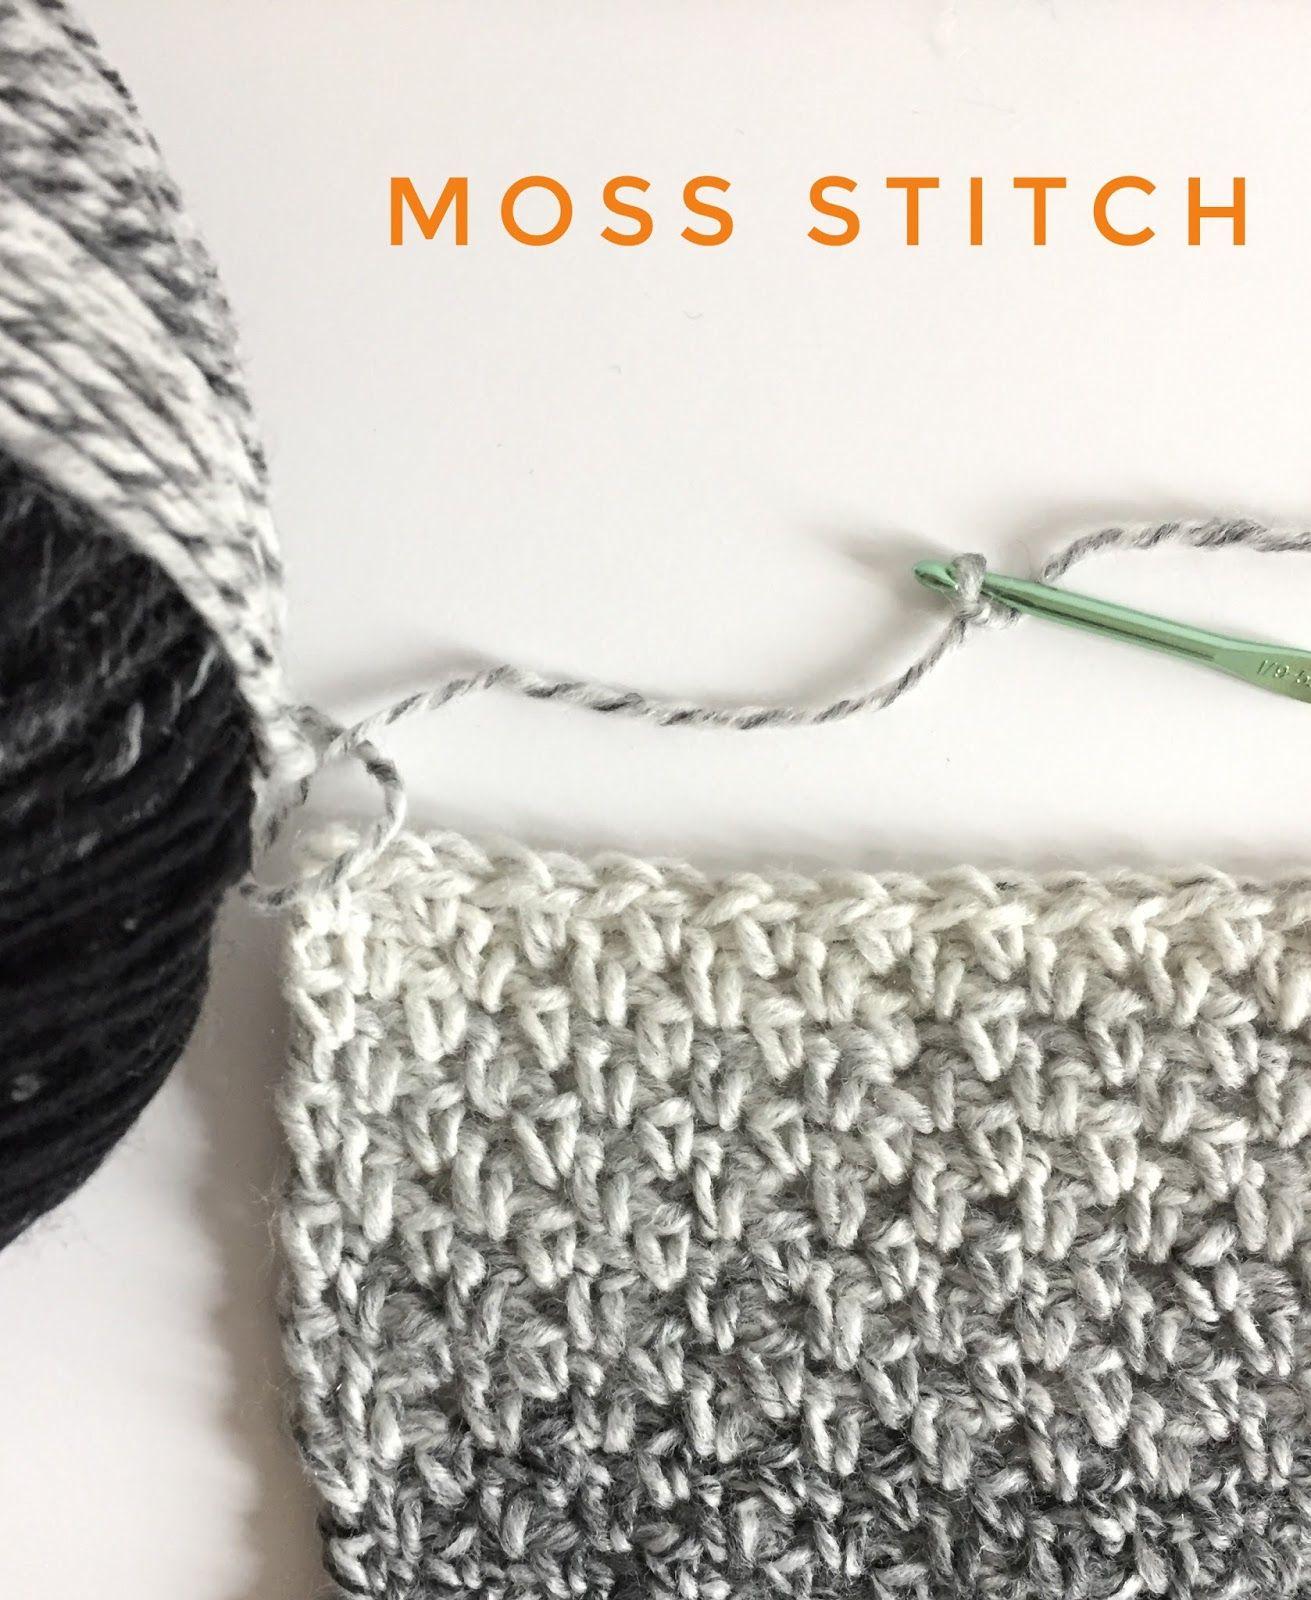 Moss Stitch - Daisy Farm Crafts | Crochet puntos | Pinterest ...